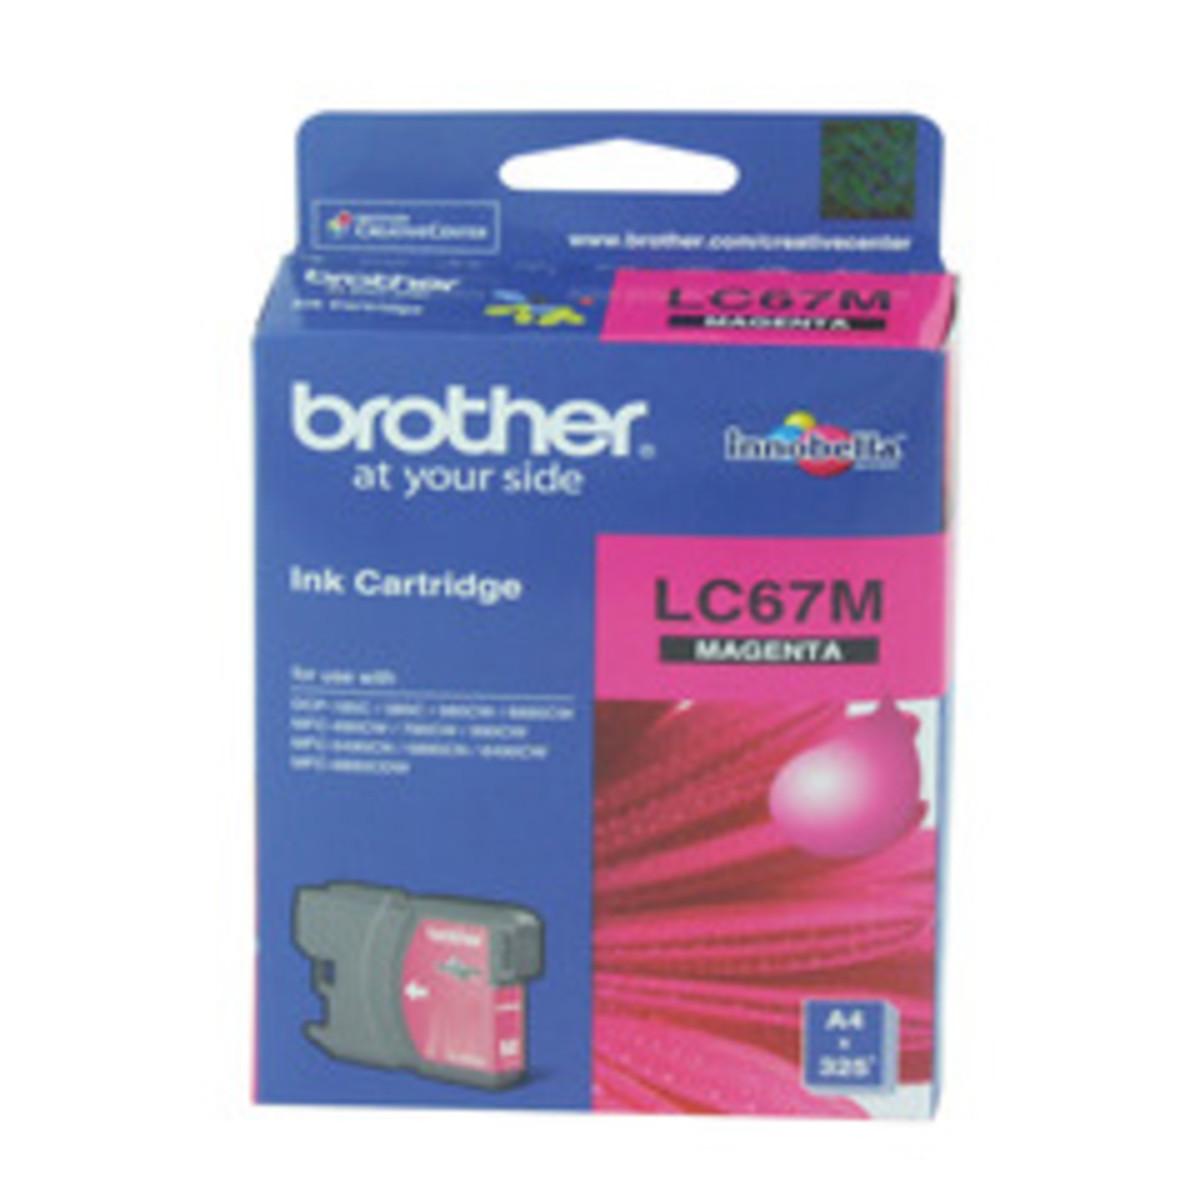 Brother LC-67M Magenta Ink Cartridge